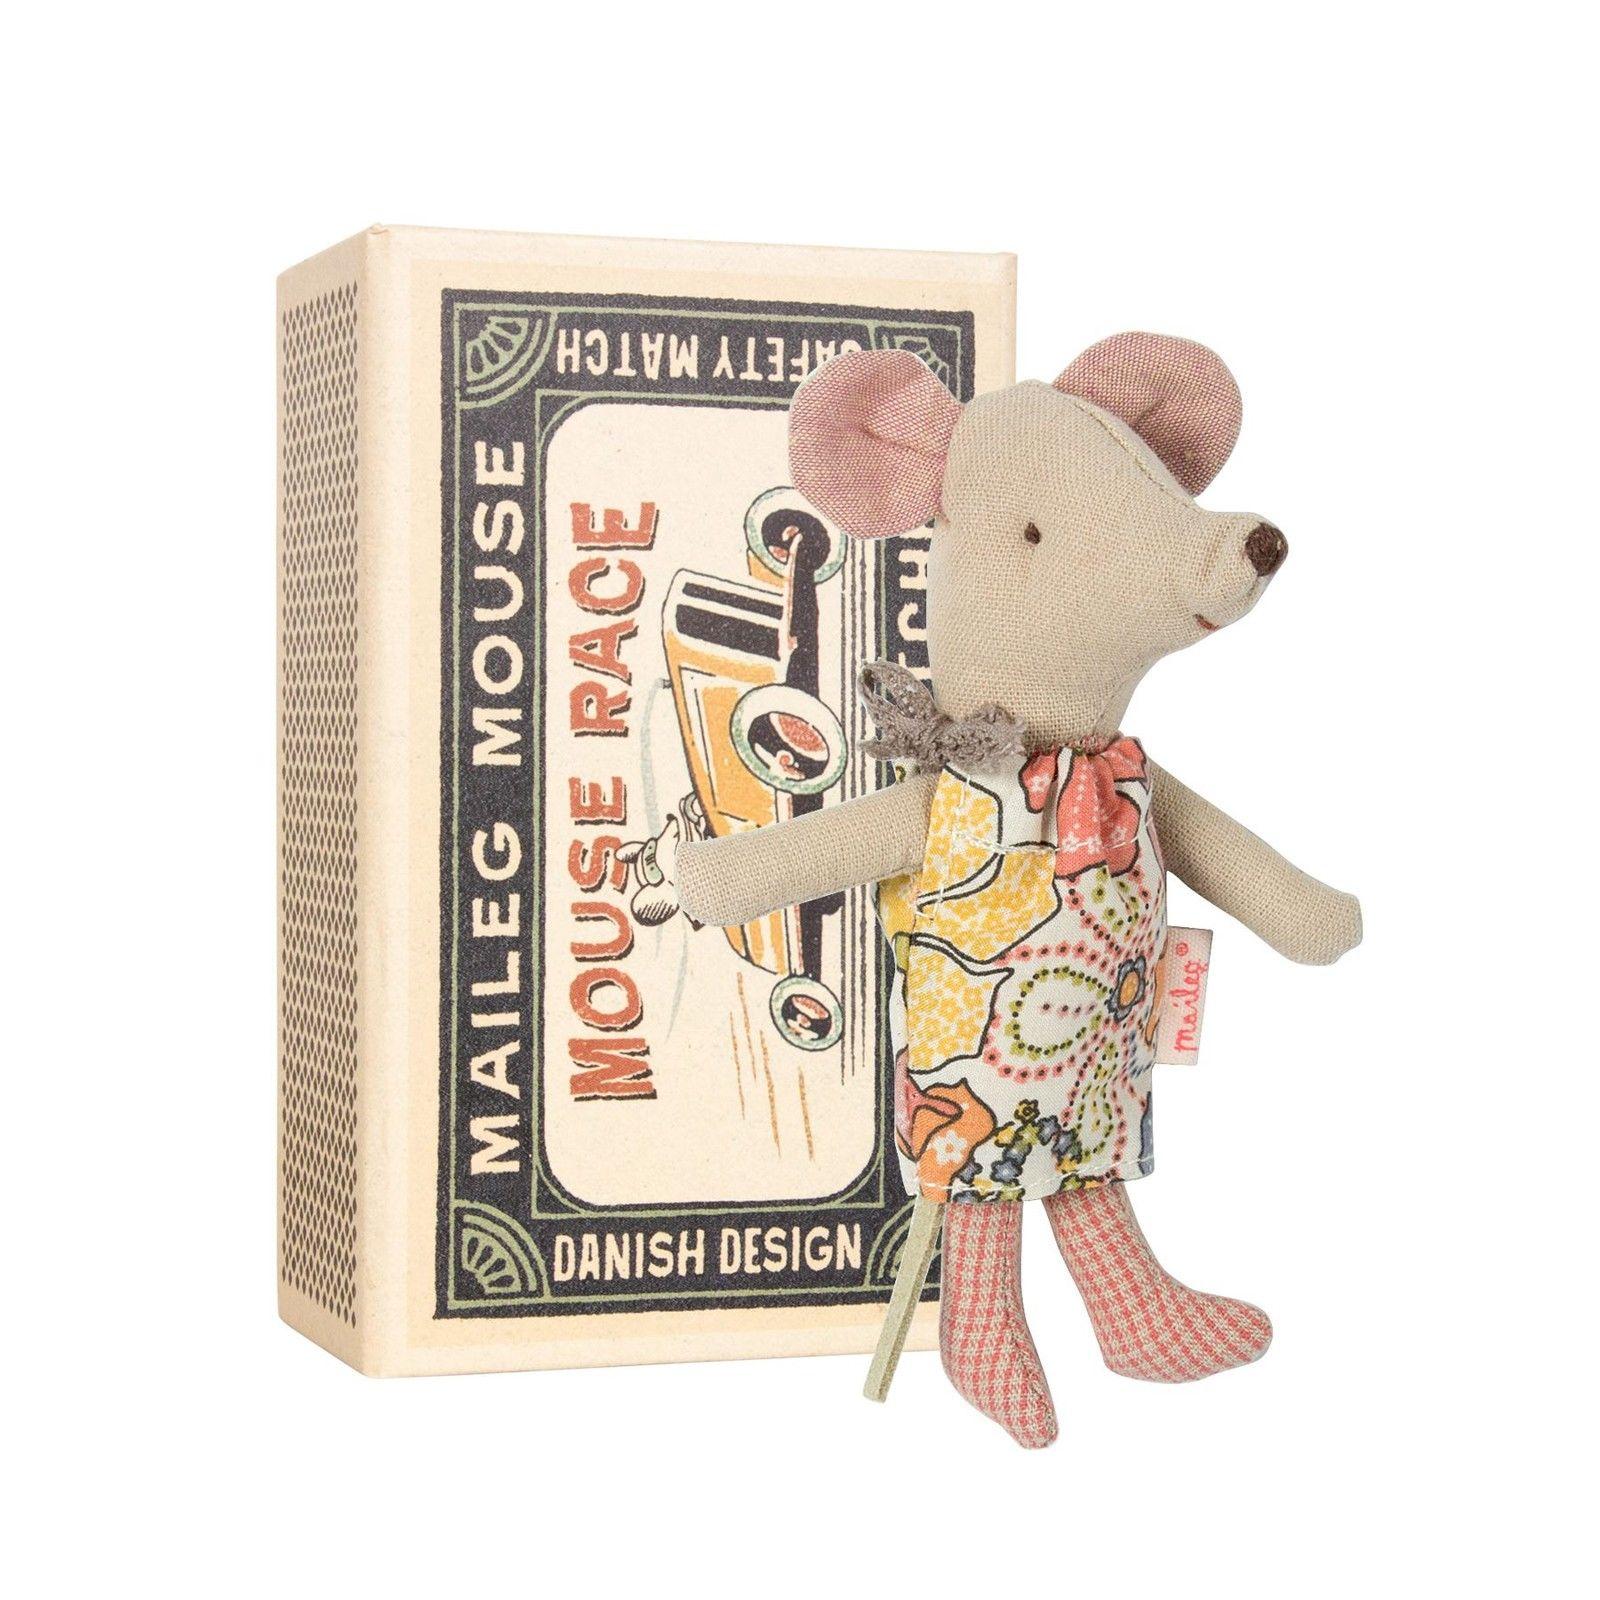 GRAHAM & GREEN LITTLE SISTER MOUSE IN A MATCHBOX - £19.95